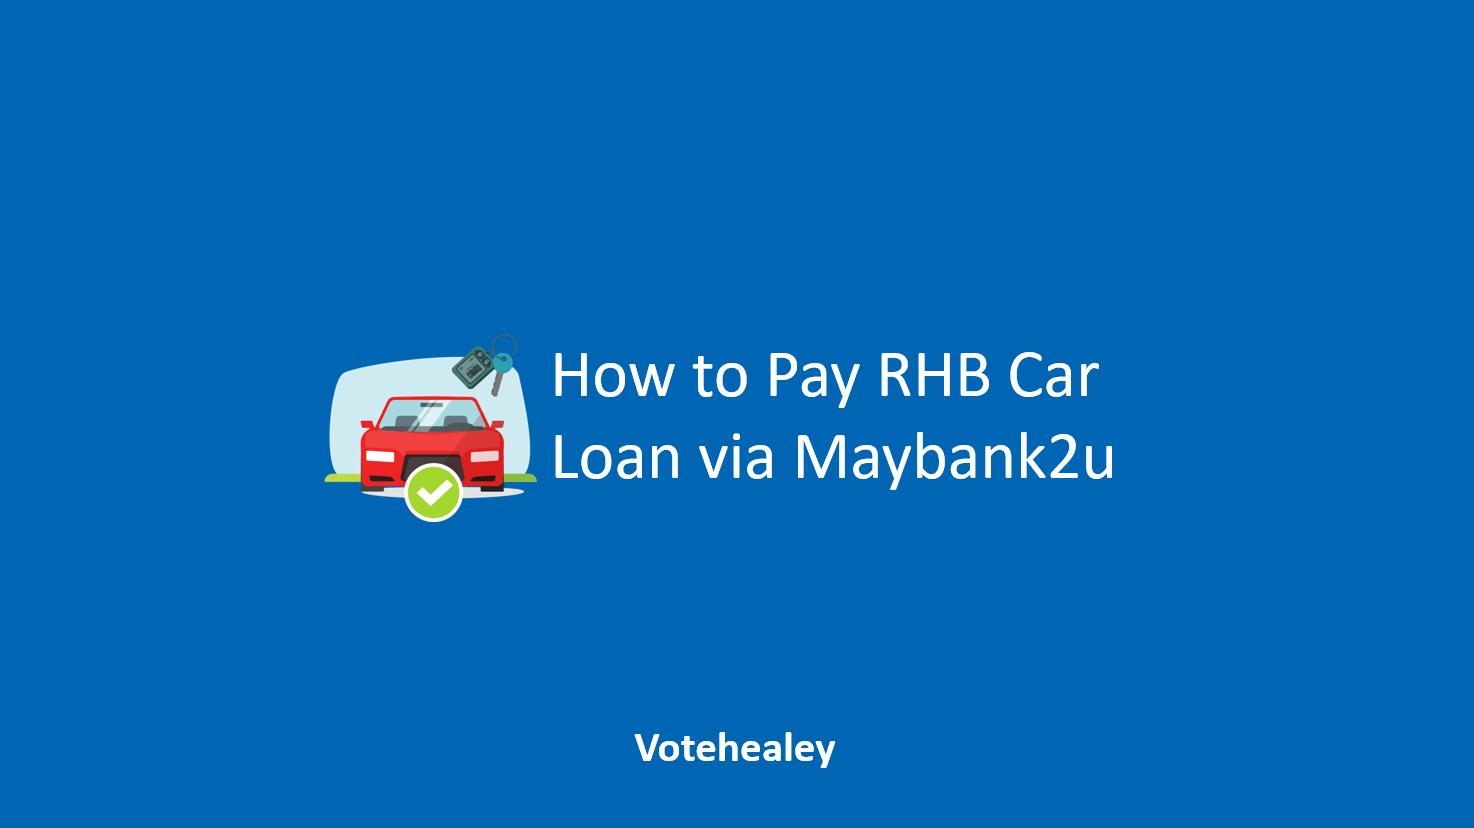 How to Pay RHB Car Loan via Maybank2u